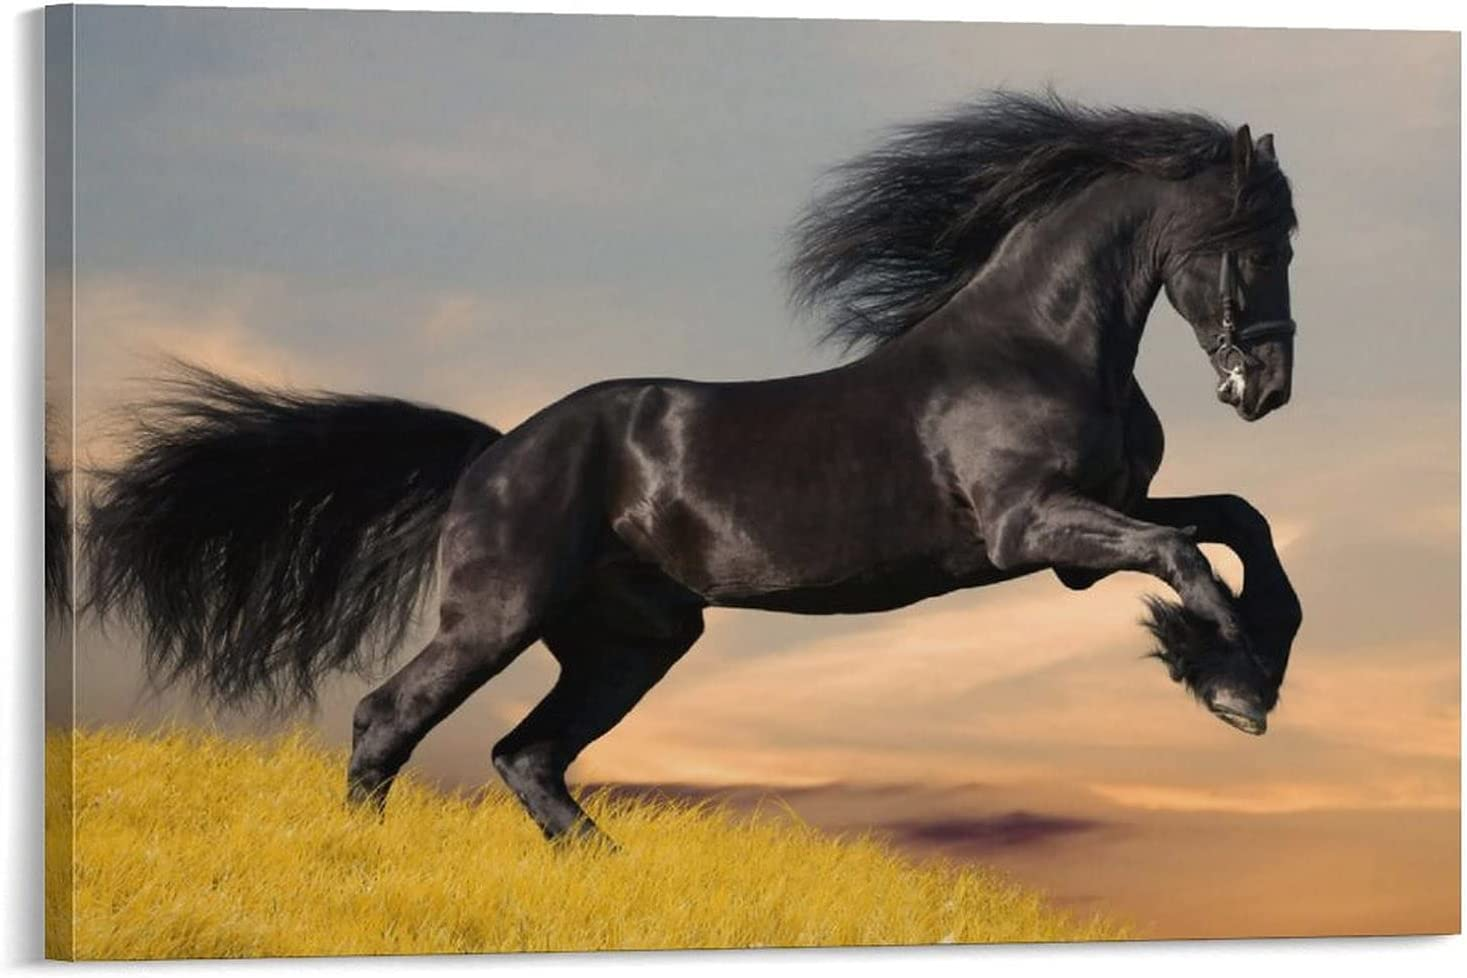 freebrand Adorable Animal Wild Horse Poster Under New popularity blast sales 1 Mo Room Children's